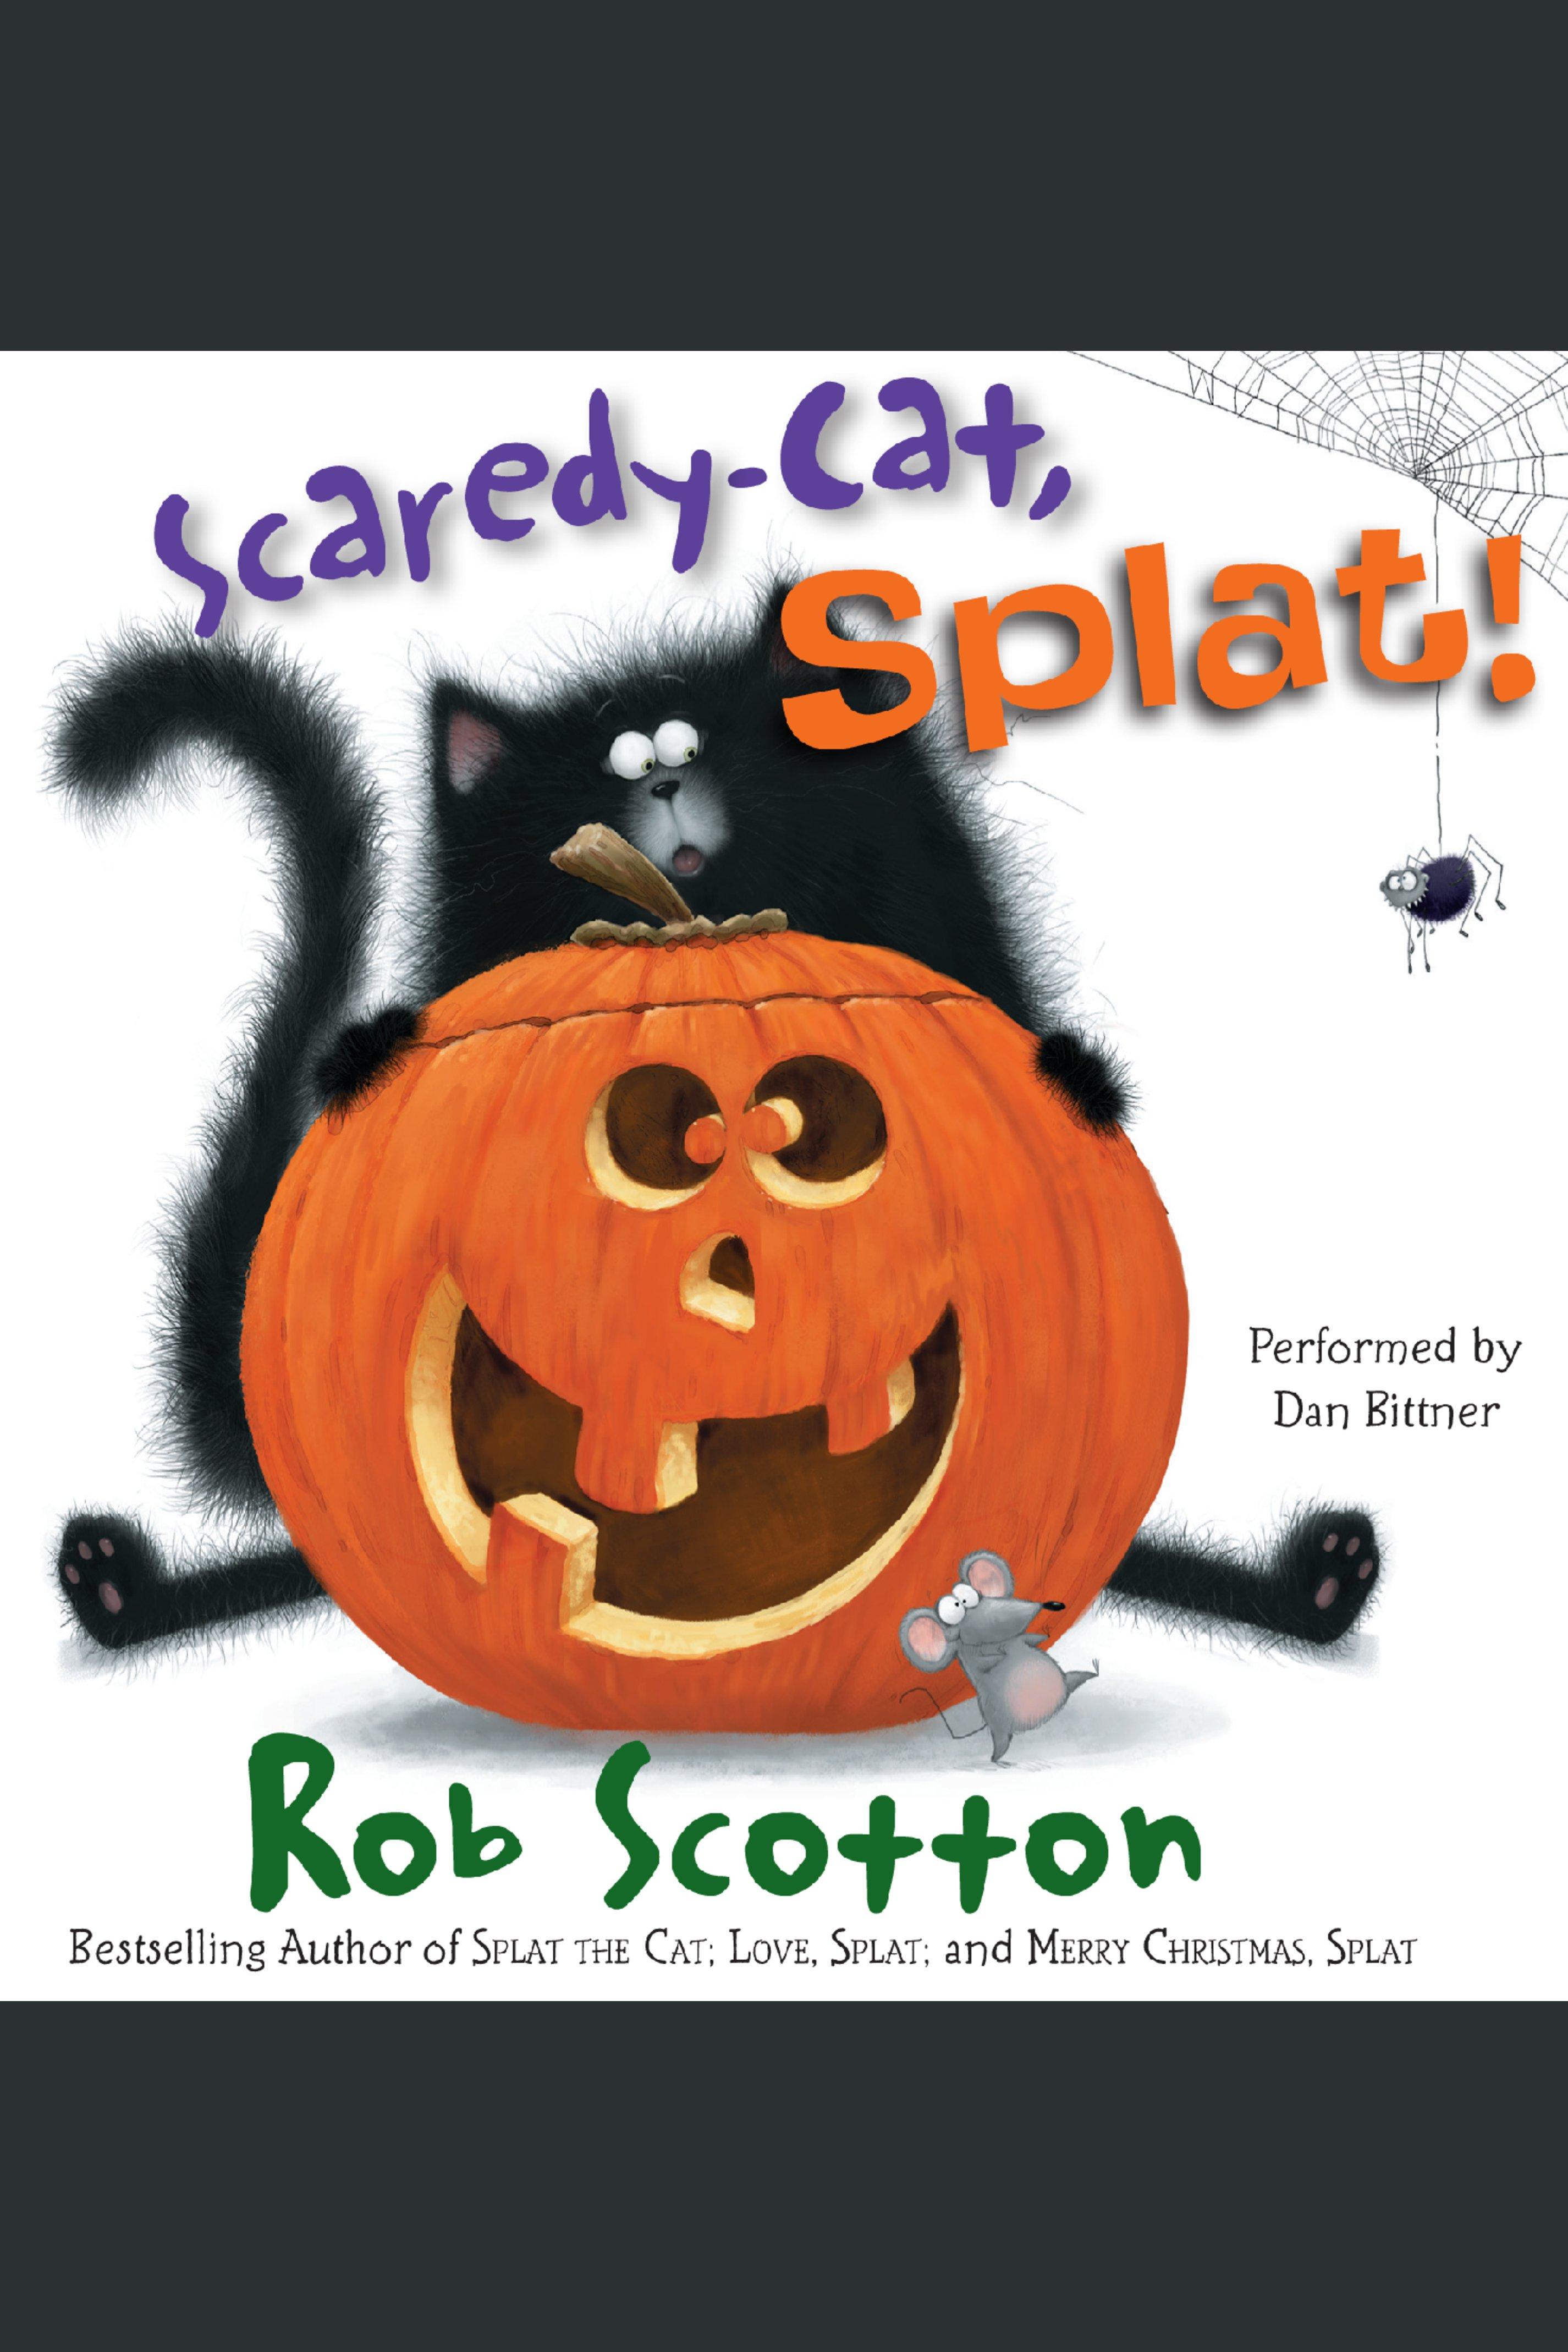 Scaredy-cat, Splat! cover image